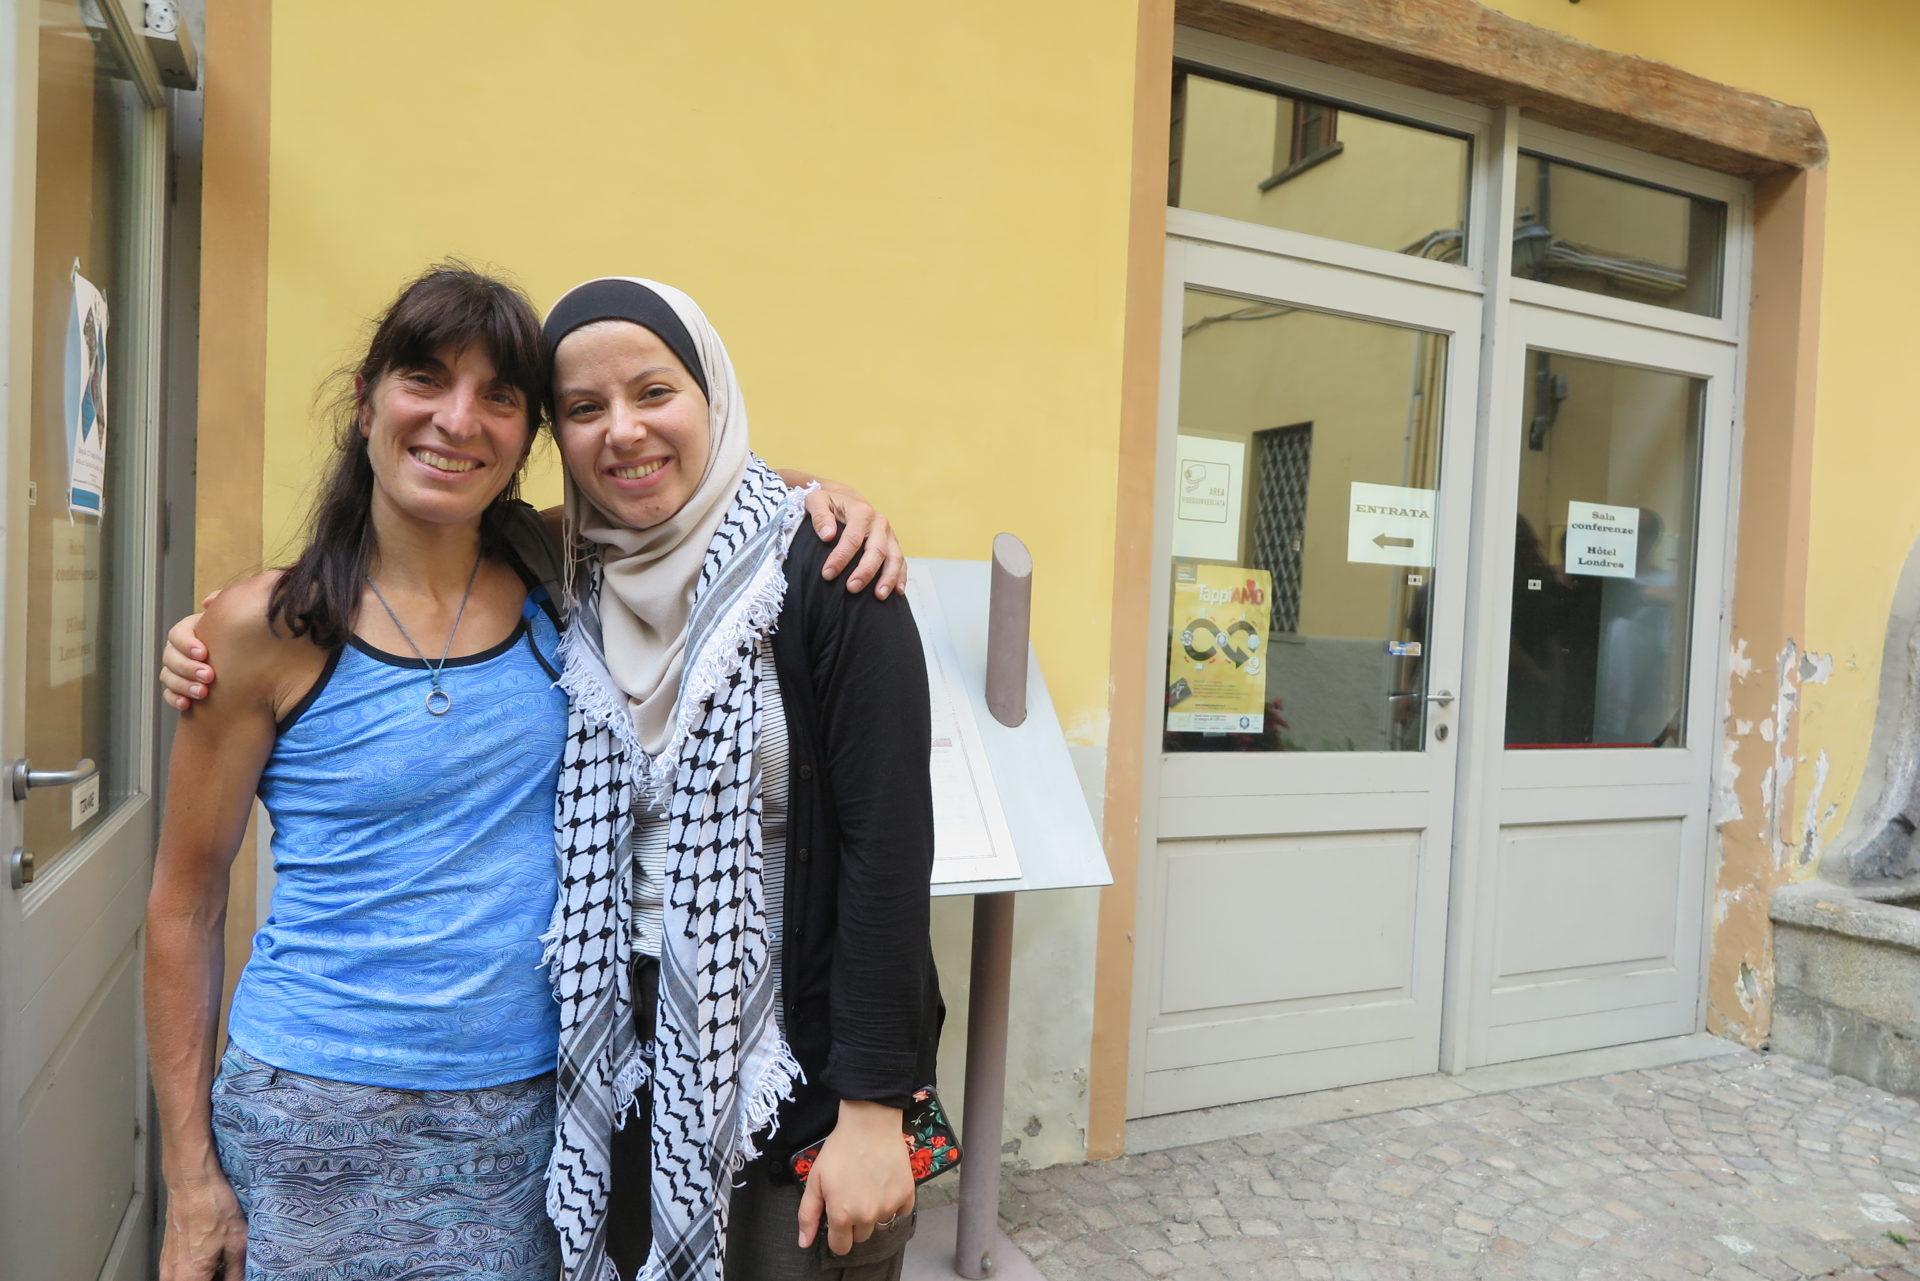 La guida alpina Anna Torretta con Yasmeen Al Najjar